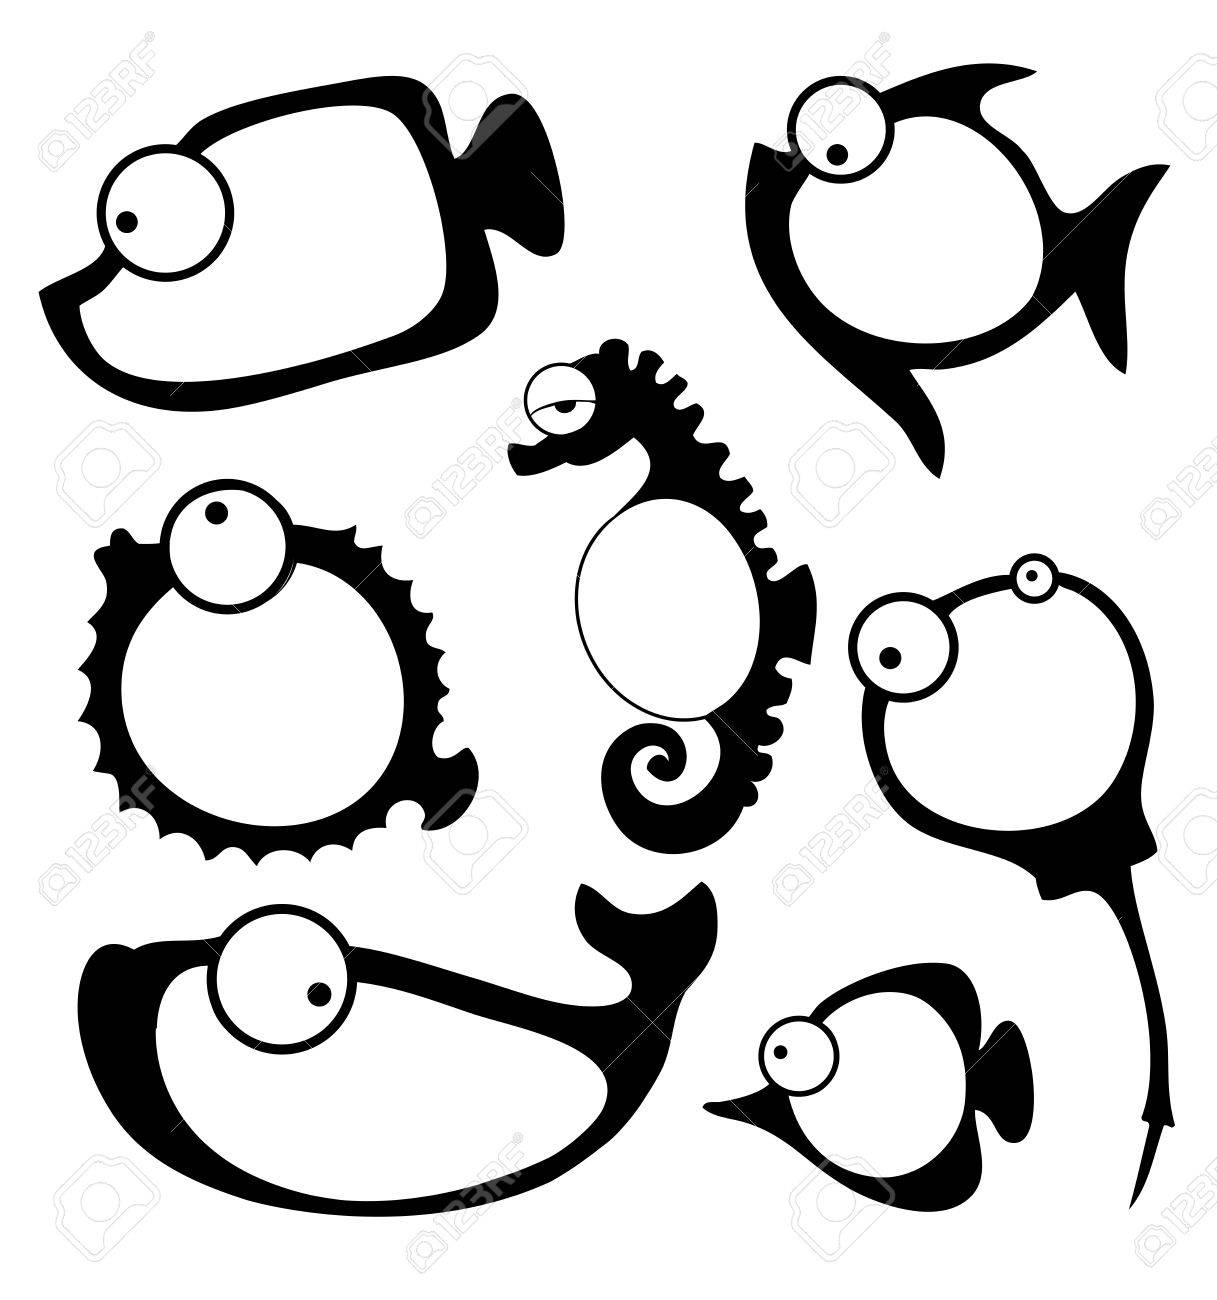 Vector illustration of fish frame - 47653384